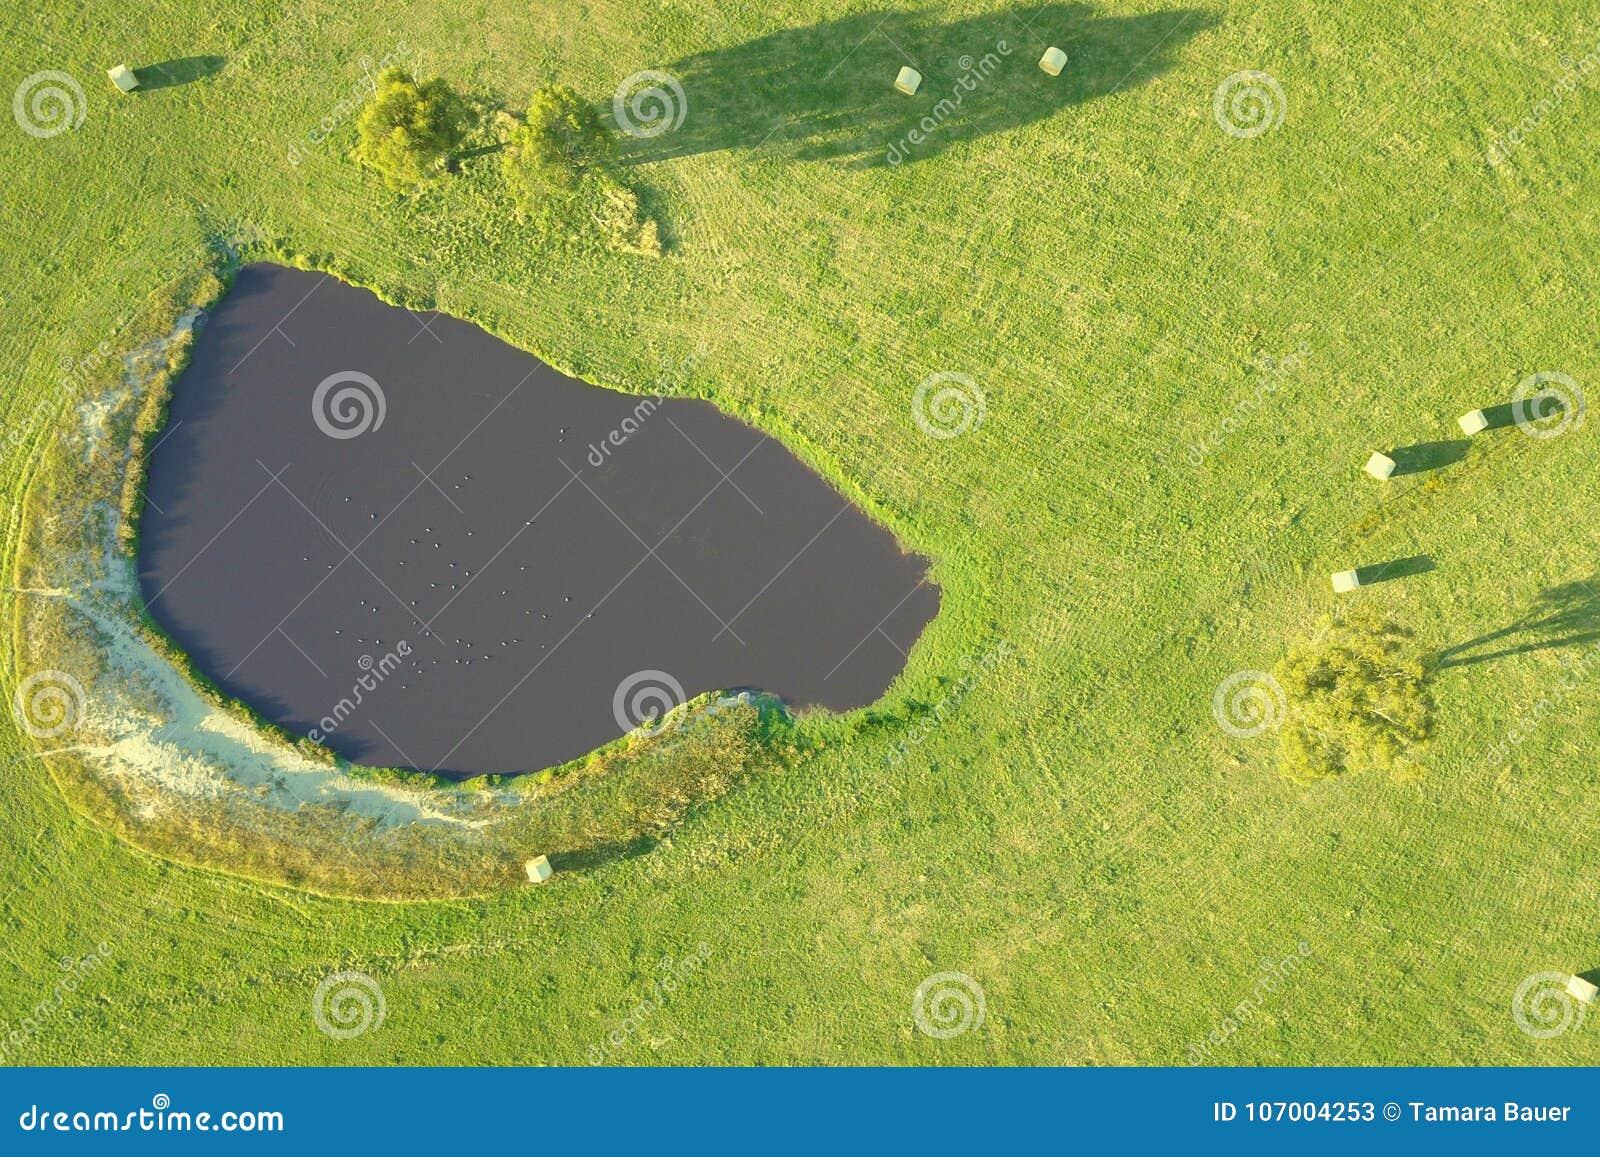 Hay bales on farmland in South Gippsland